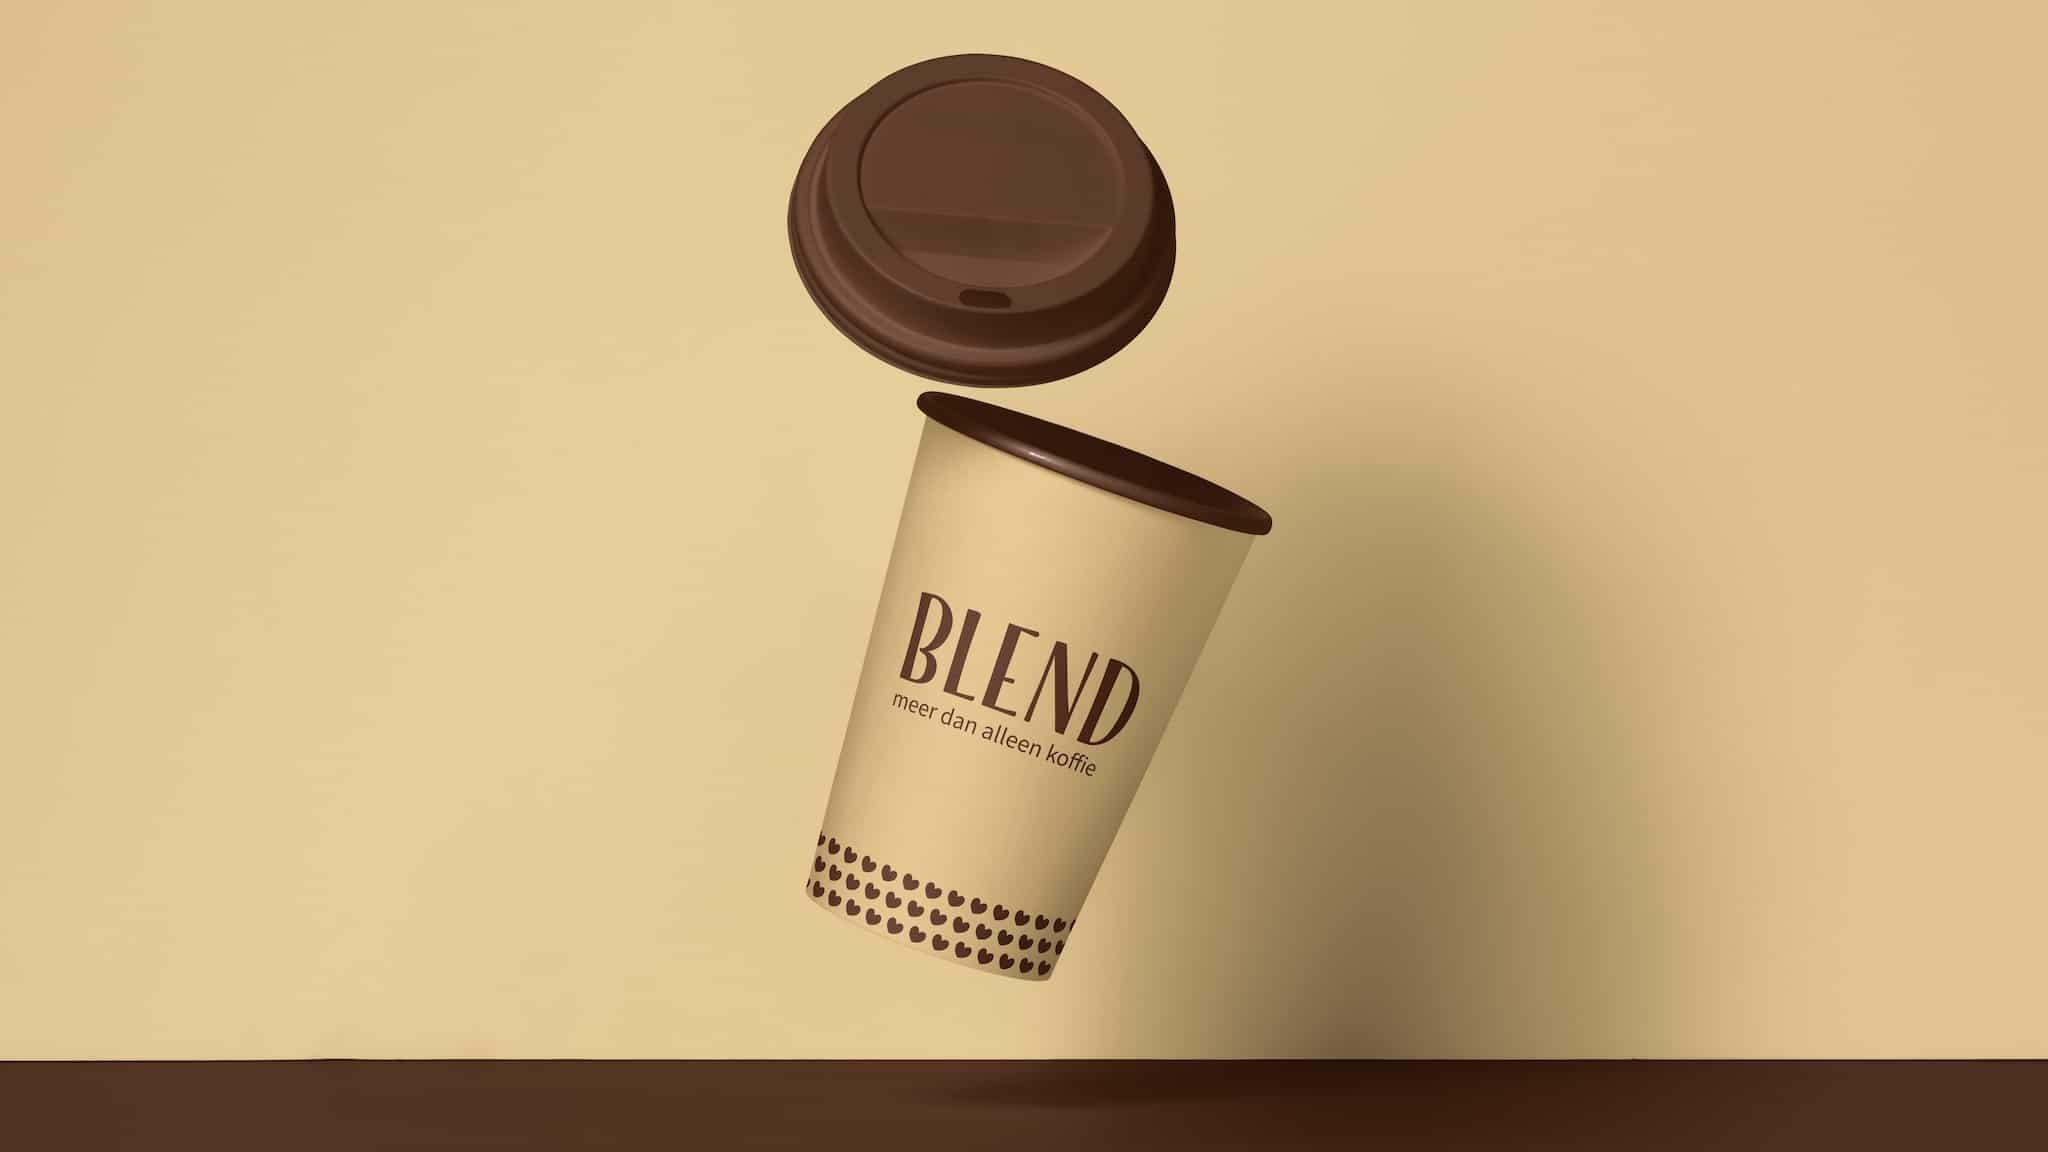 Larkom Blend koffie beker v1